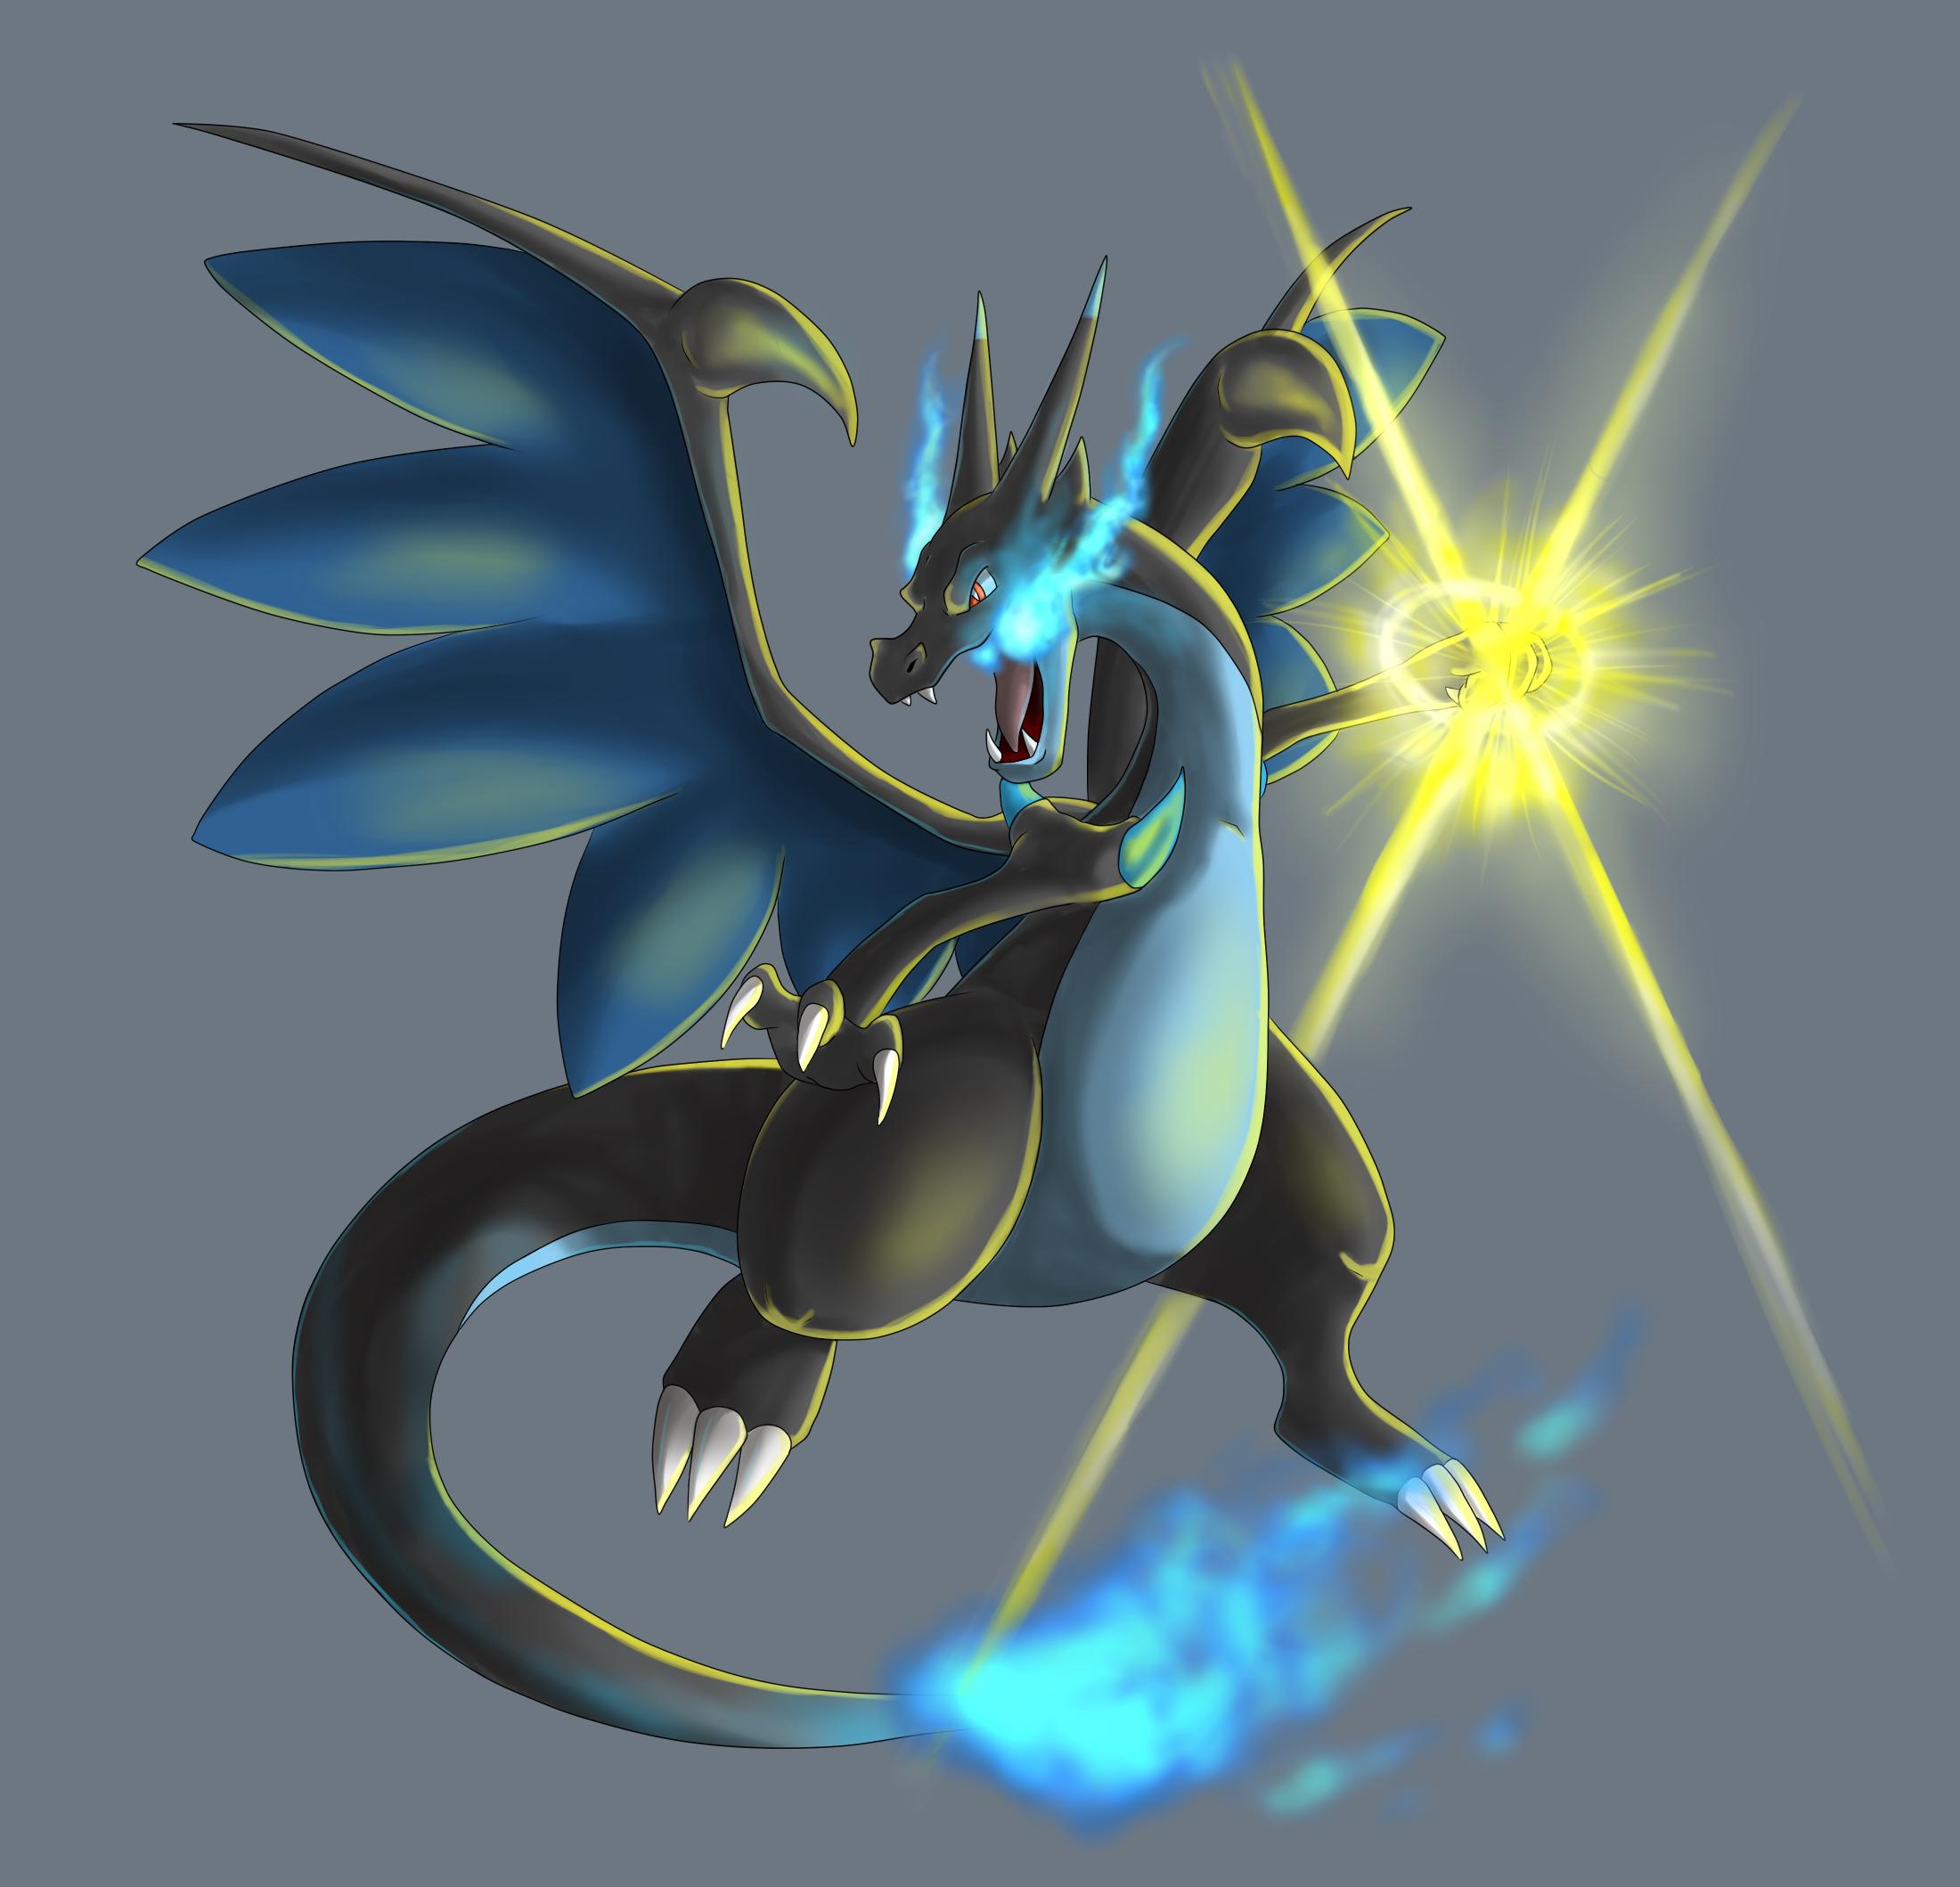 MEGAPUNCH! by IcelectricSpyro on DeviantArt | Cute pokemon wallpaper,  Pokemon dragon, Moltres pokemon